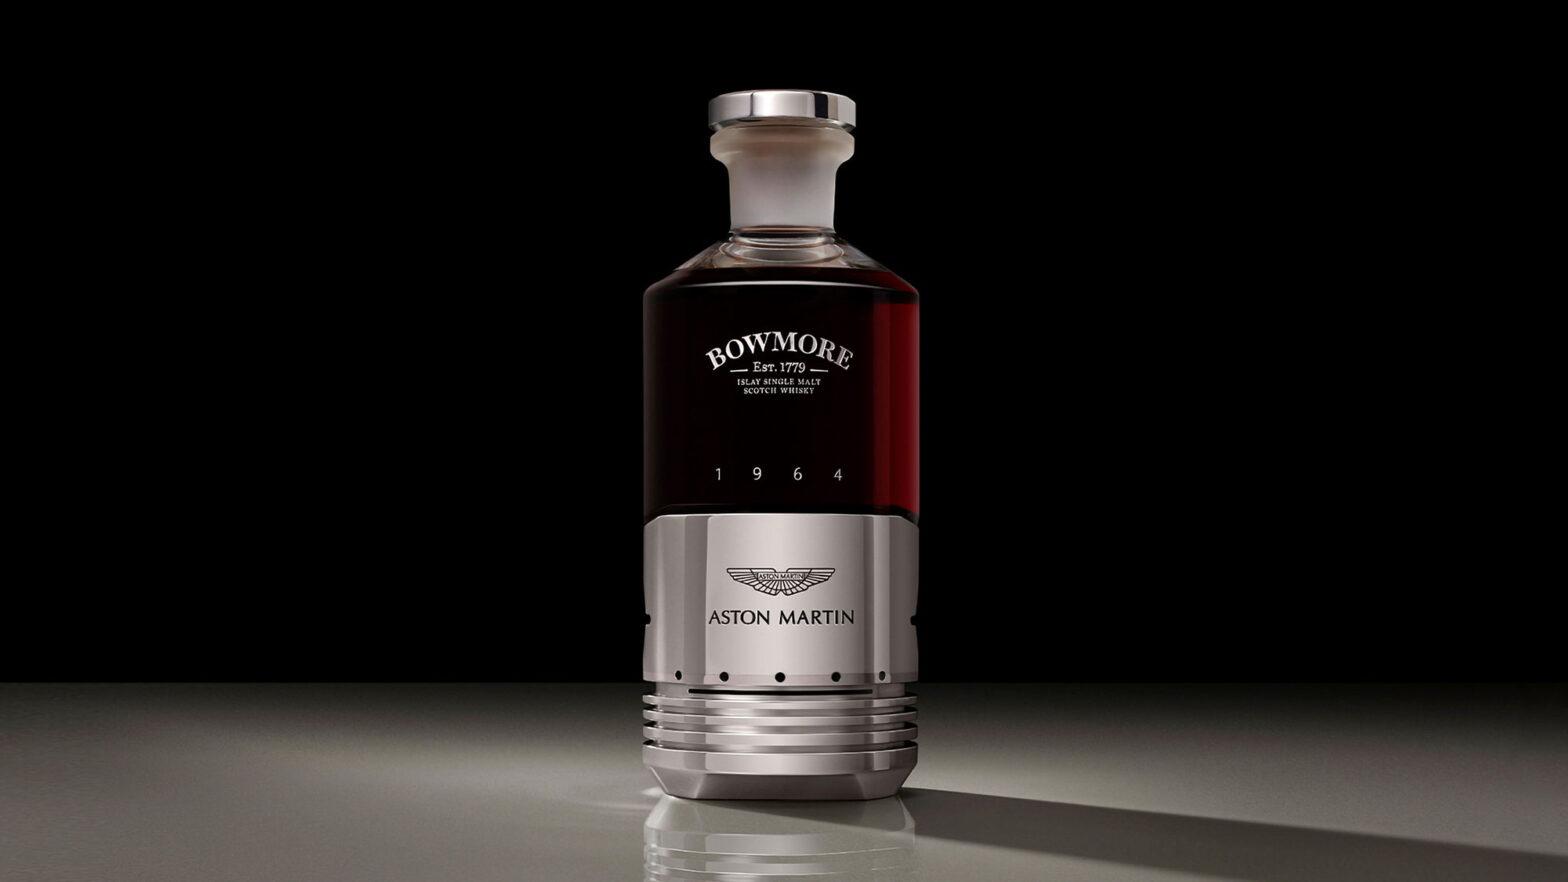 Bowmore x Aston Martin Black DB5 1964 Whisky